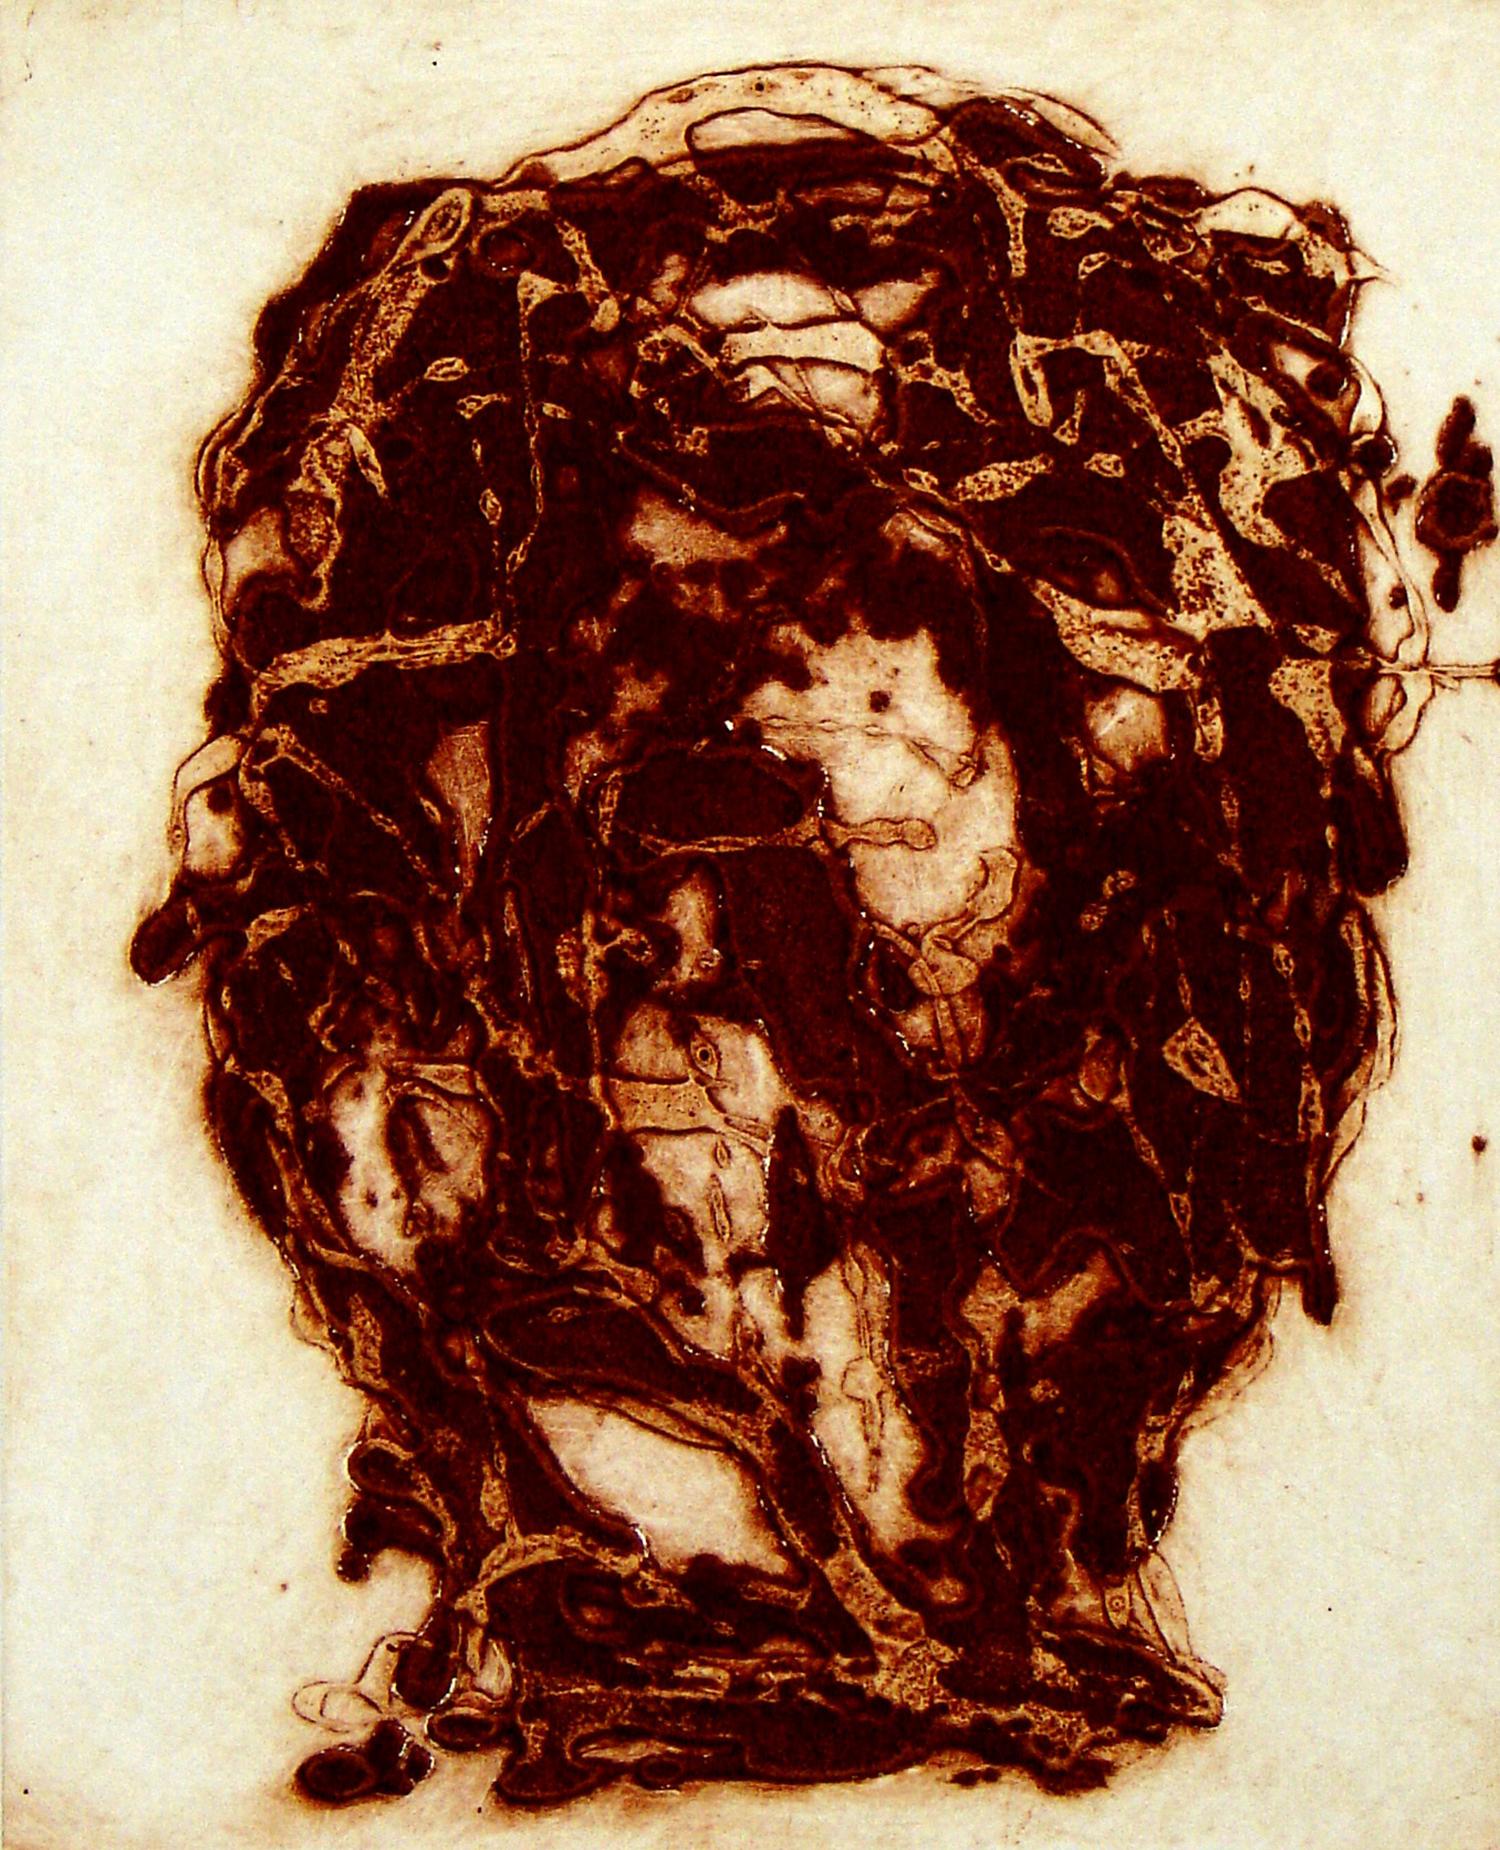 Peter Griffin Carborundum Head IV    Date:  2007   Size (cm - unframed):  45 x 35.5   Technique:  Carborundum Etching   Materials:  Moulin Du Gue 300gsm   Edition size:  6   Publisher:  The Artist   Copyright:  The Artist    P.O.A.